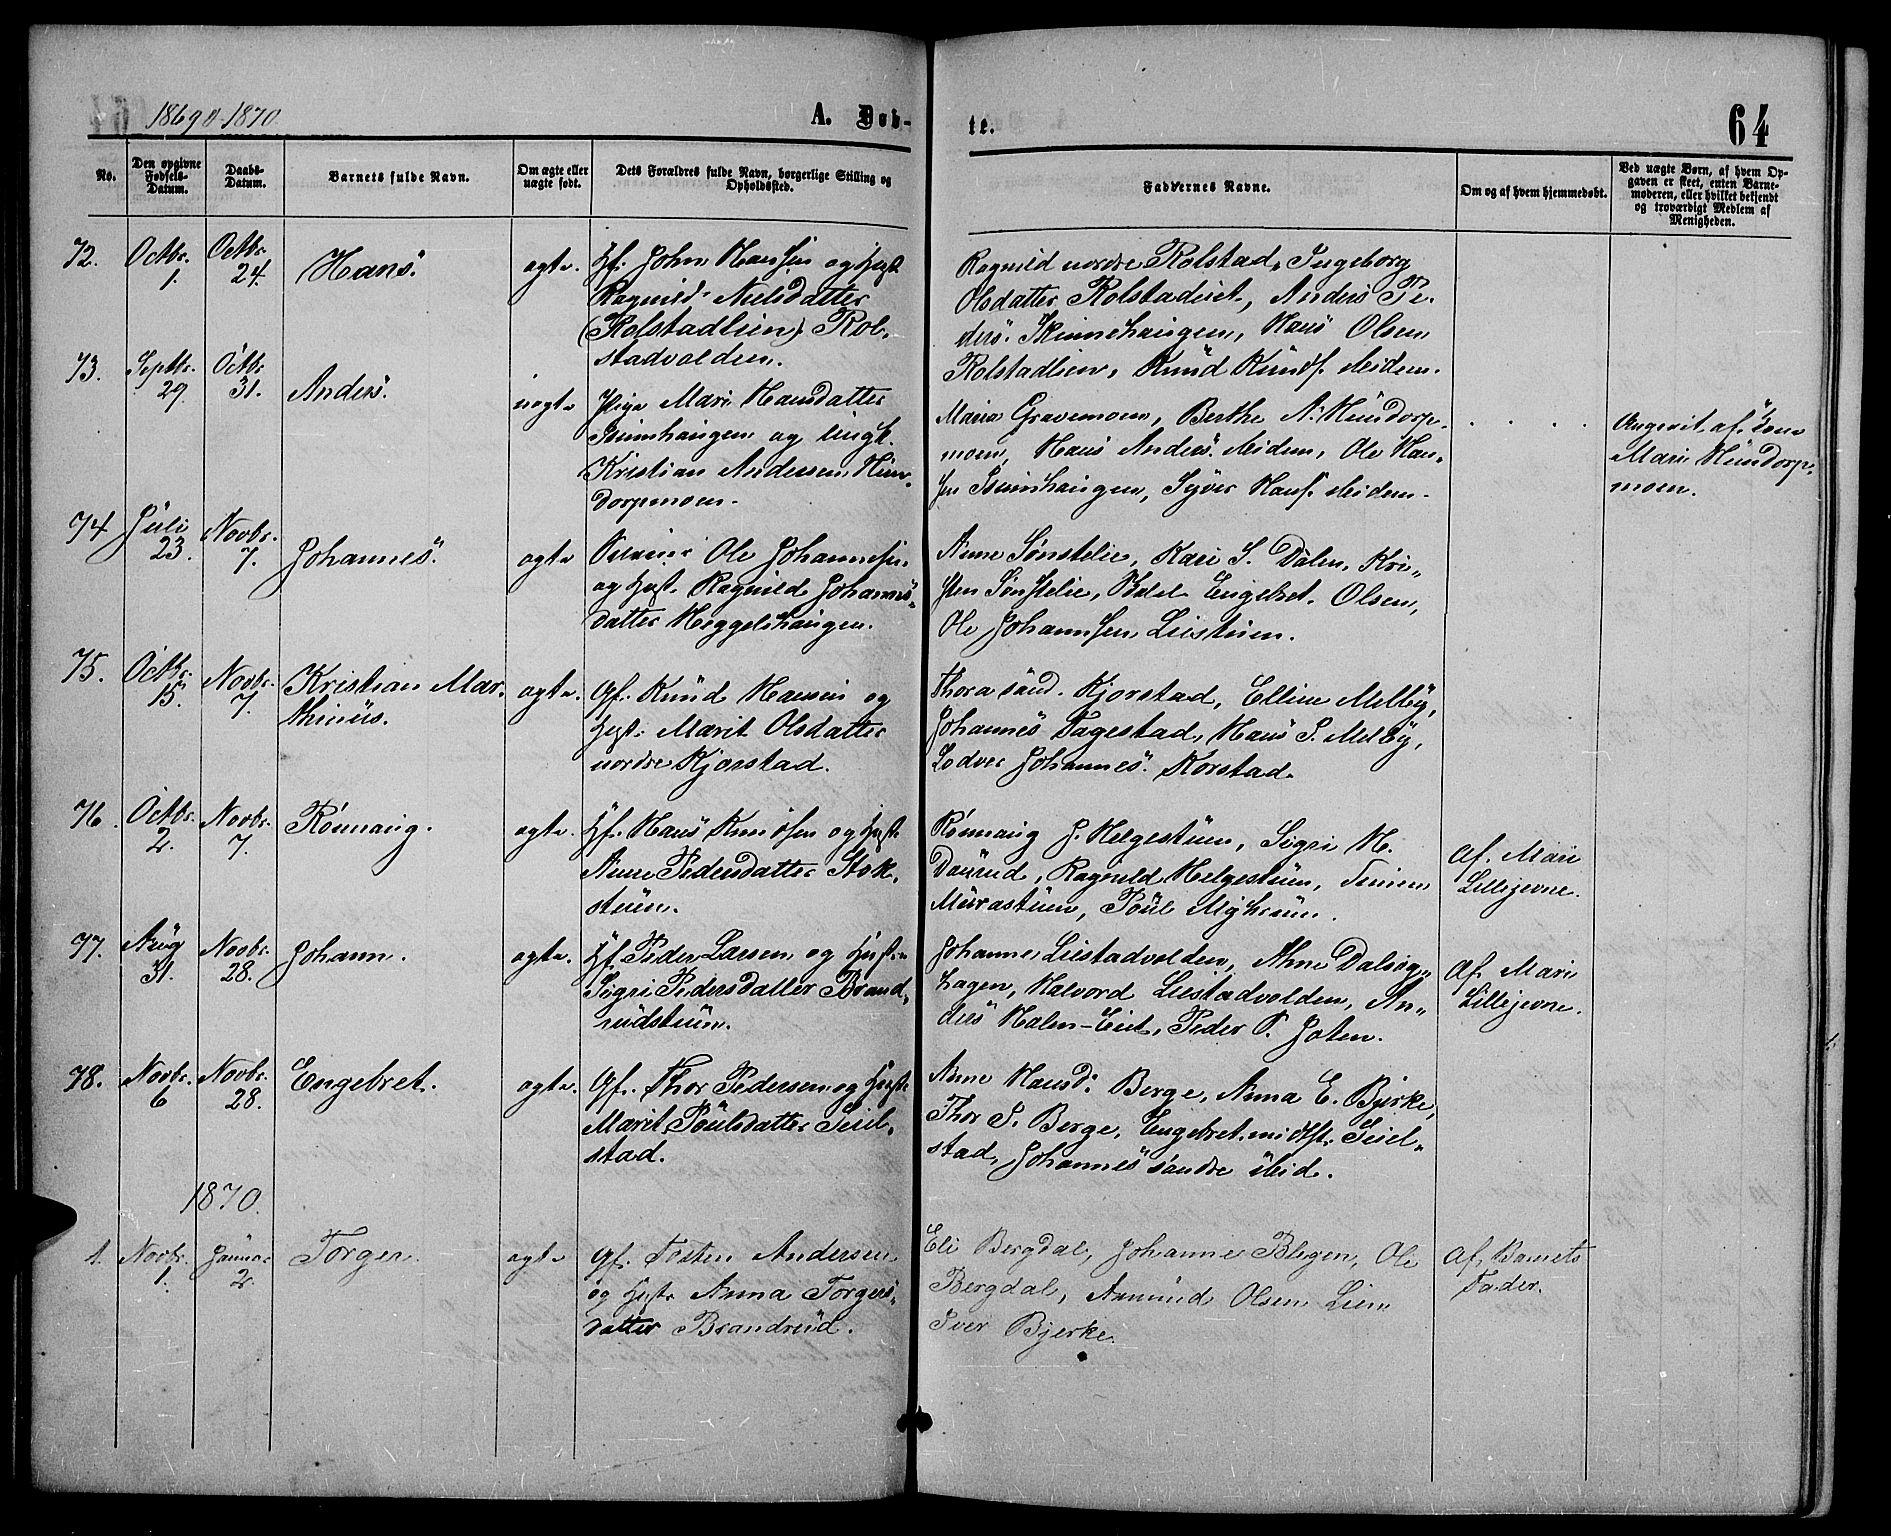 SAH, Sør-Fron prestekontor, H/Ha/Hab/L0002: Klokkerbok nr. 2, 1864-1883, s. 64